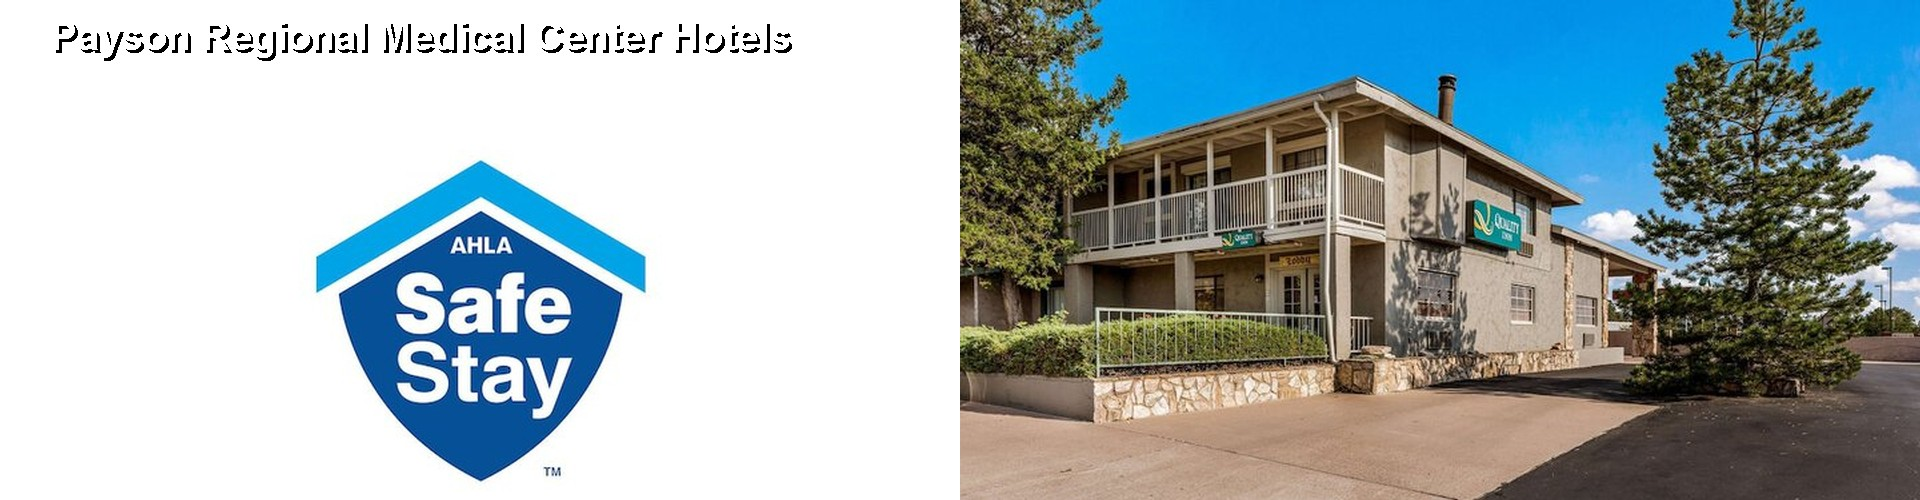 5 Best Hotels Near Payson Regional Medical Center